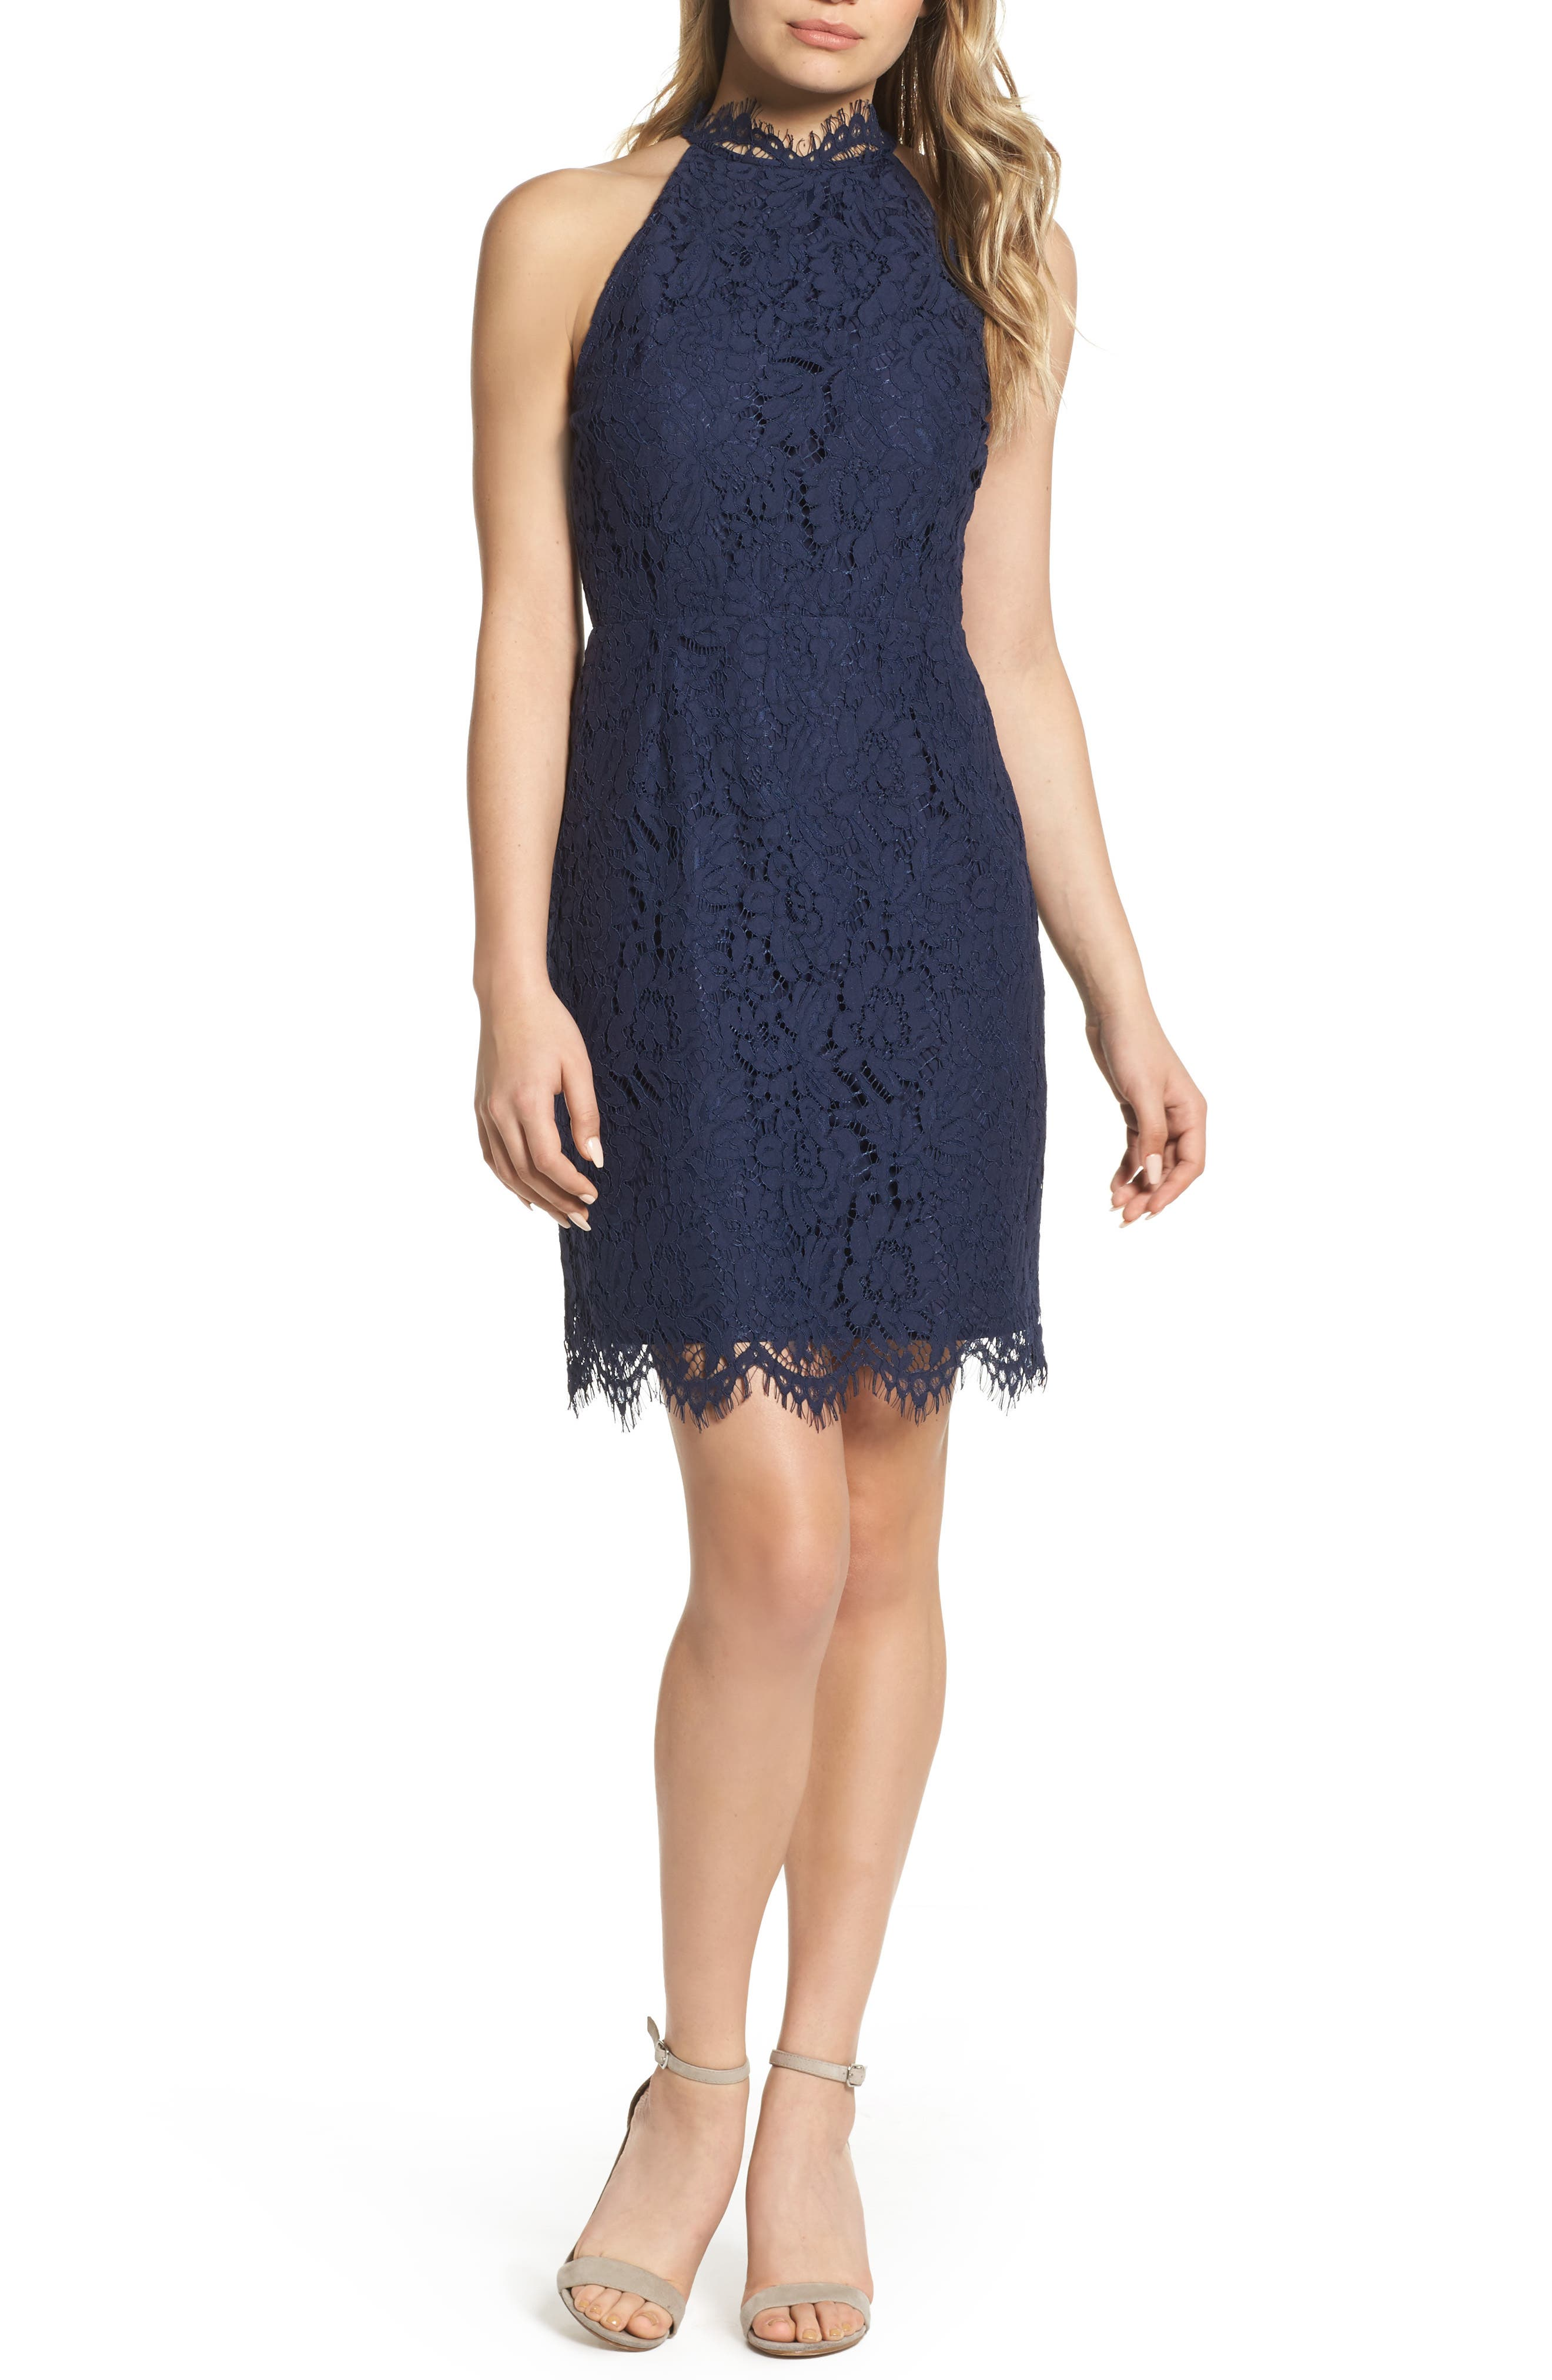 Bb Dakota Cara High Neck Lace Cocktail Dress, Blue